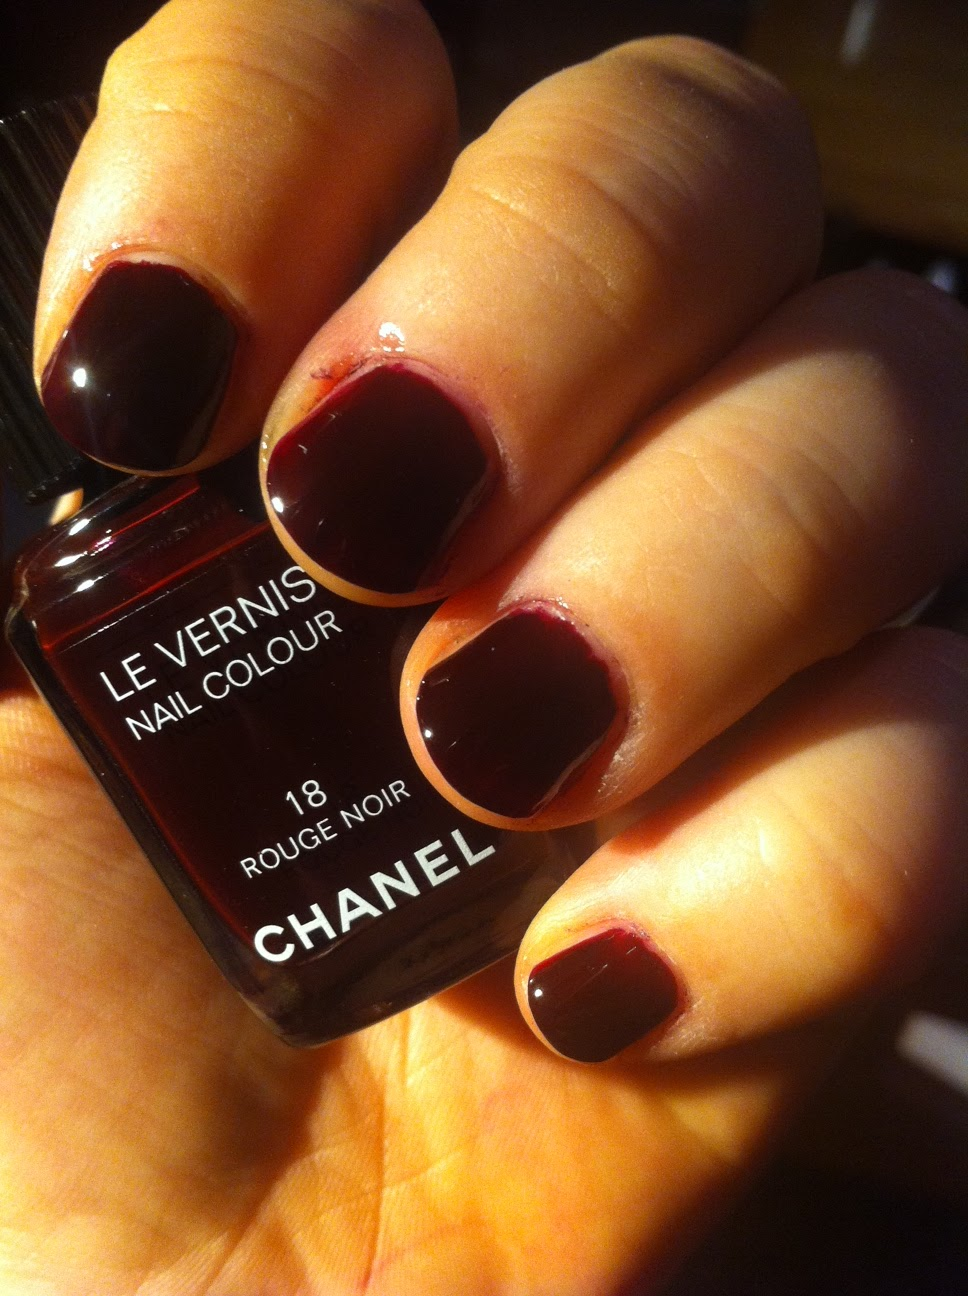 probieren geht ber studieren chanel nagellack rouge noir. Black Bedroom Furniture Sets. Home Design Ideas